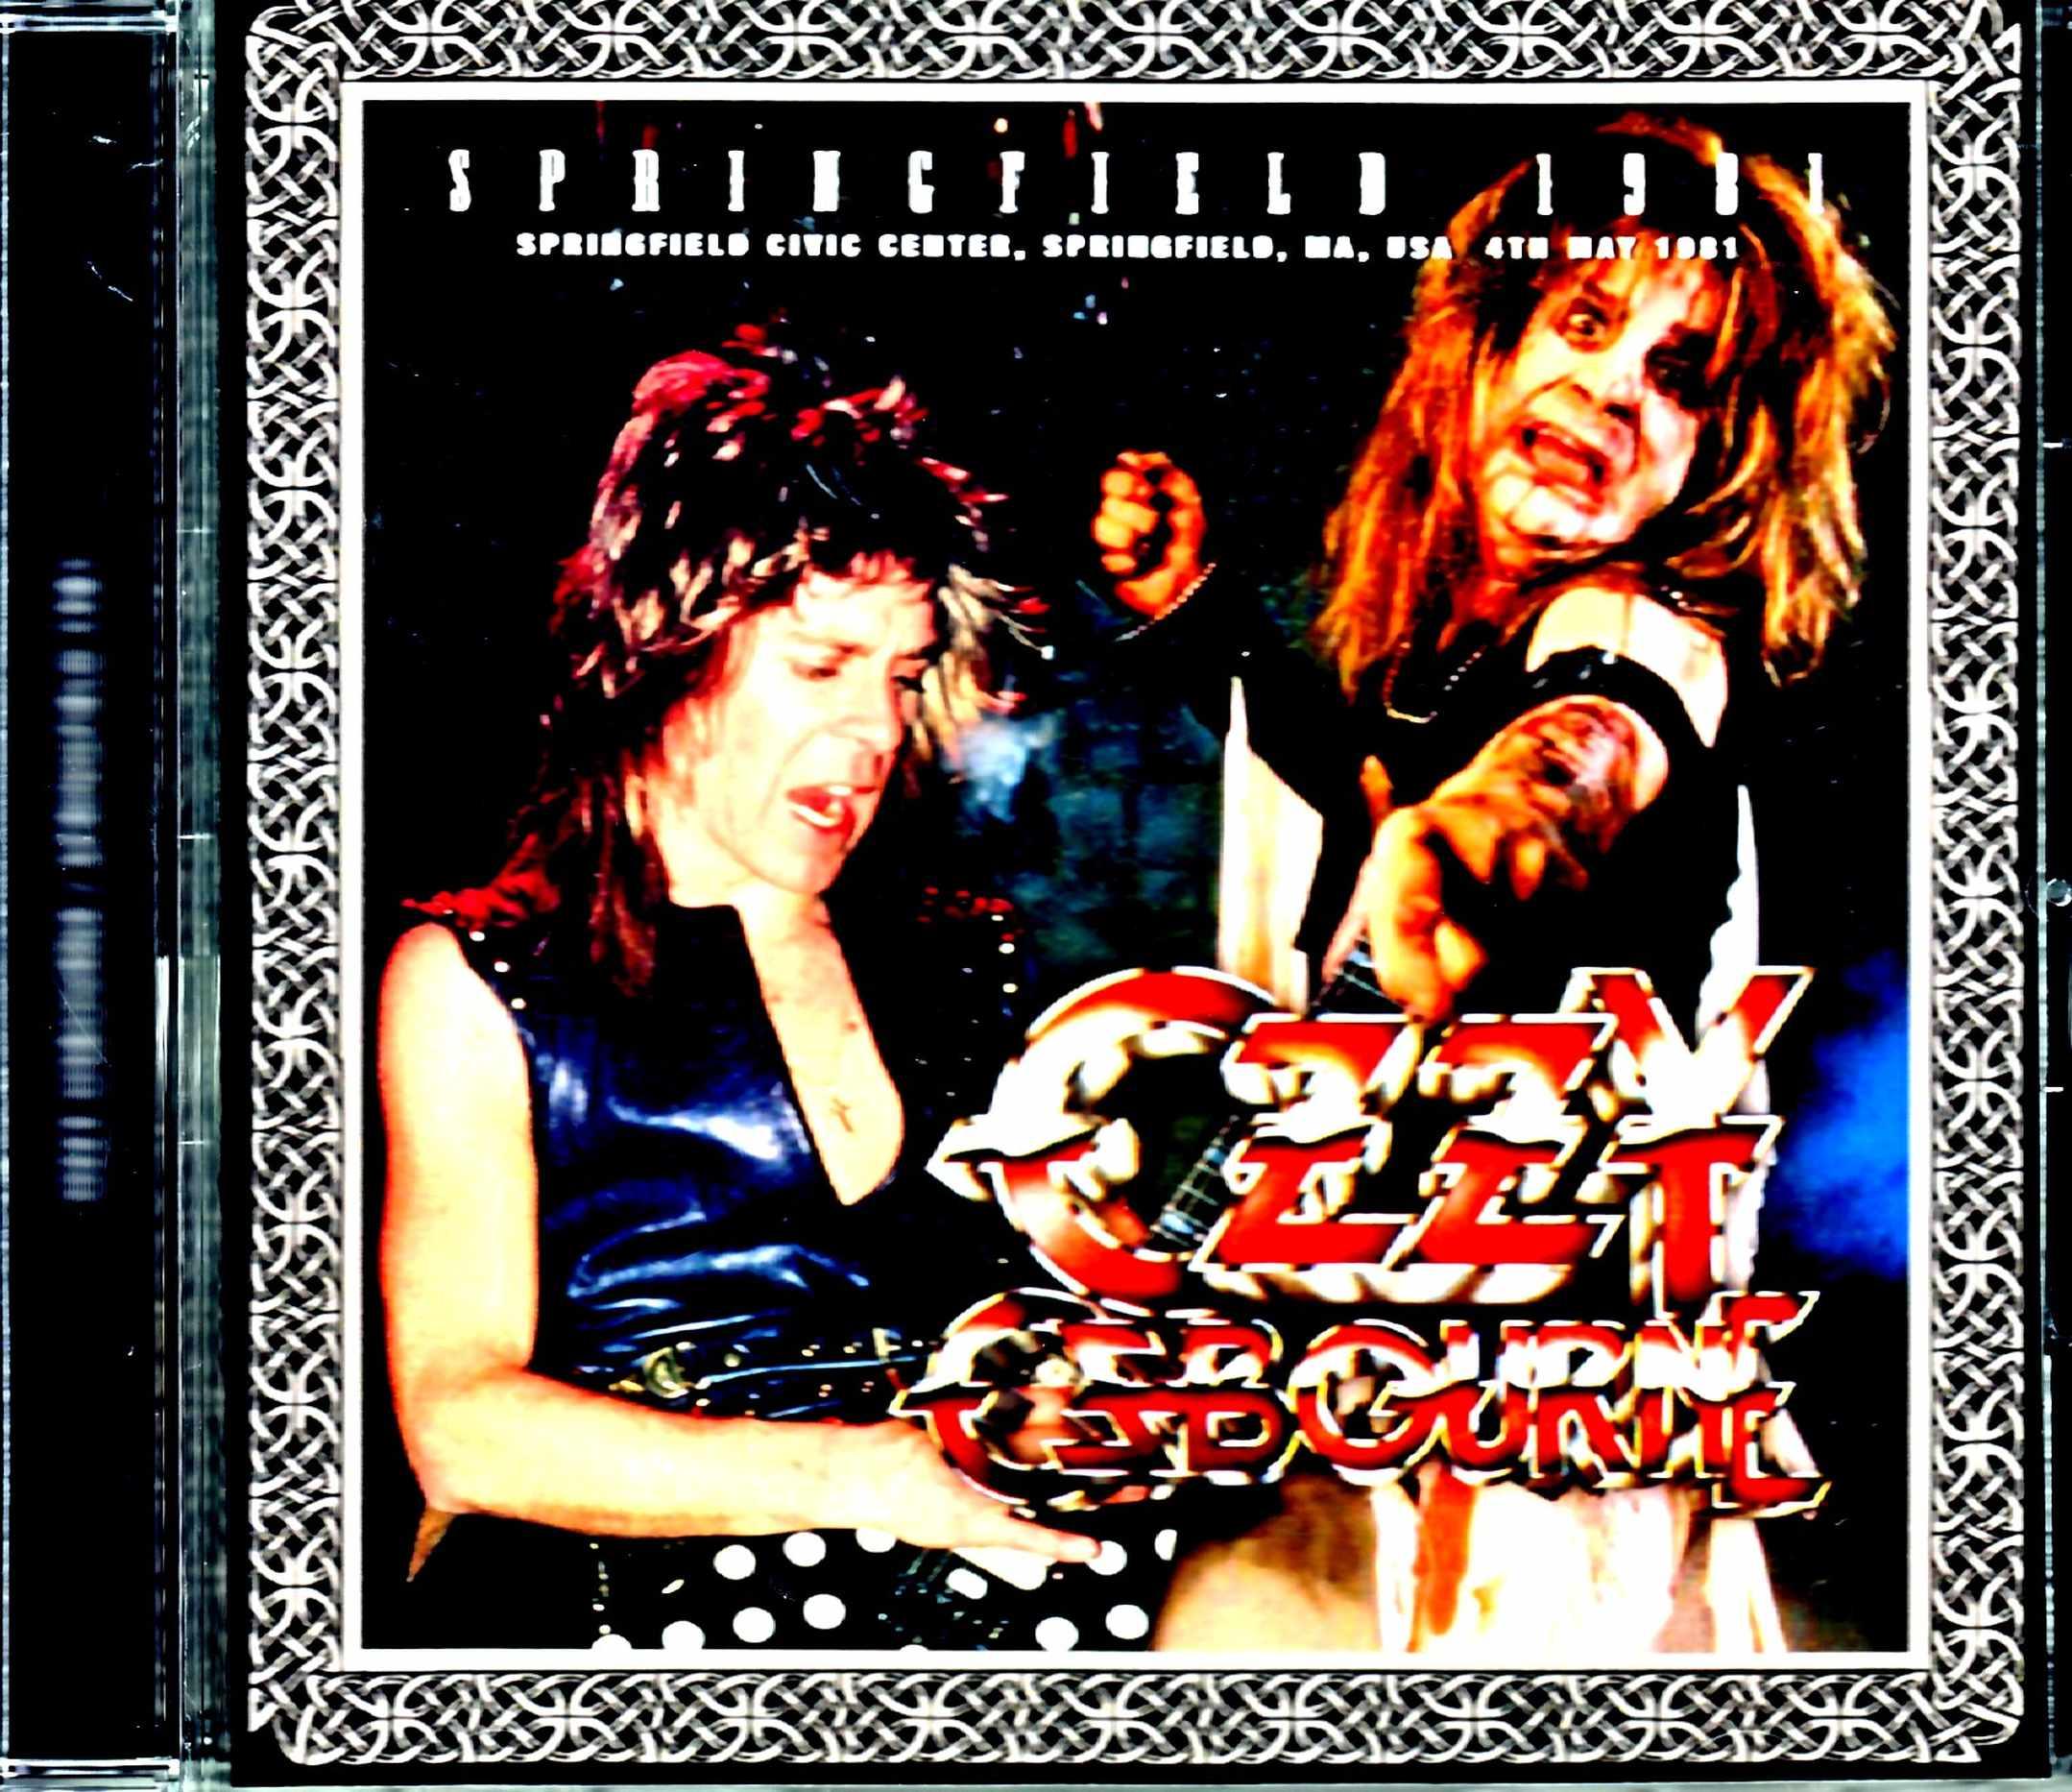 Ozzy Osbourne オジー・オズボーン/MA,USA 1981